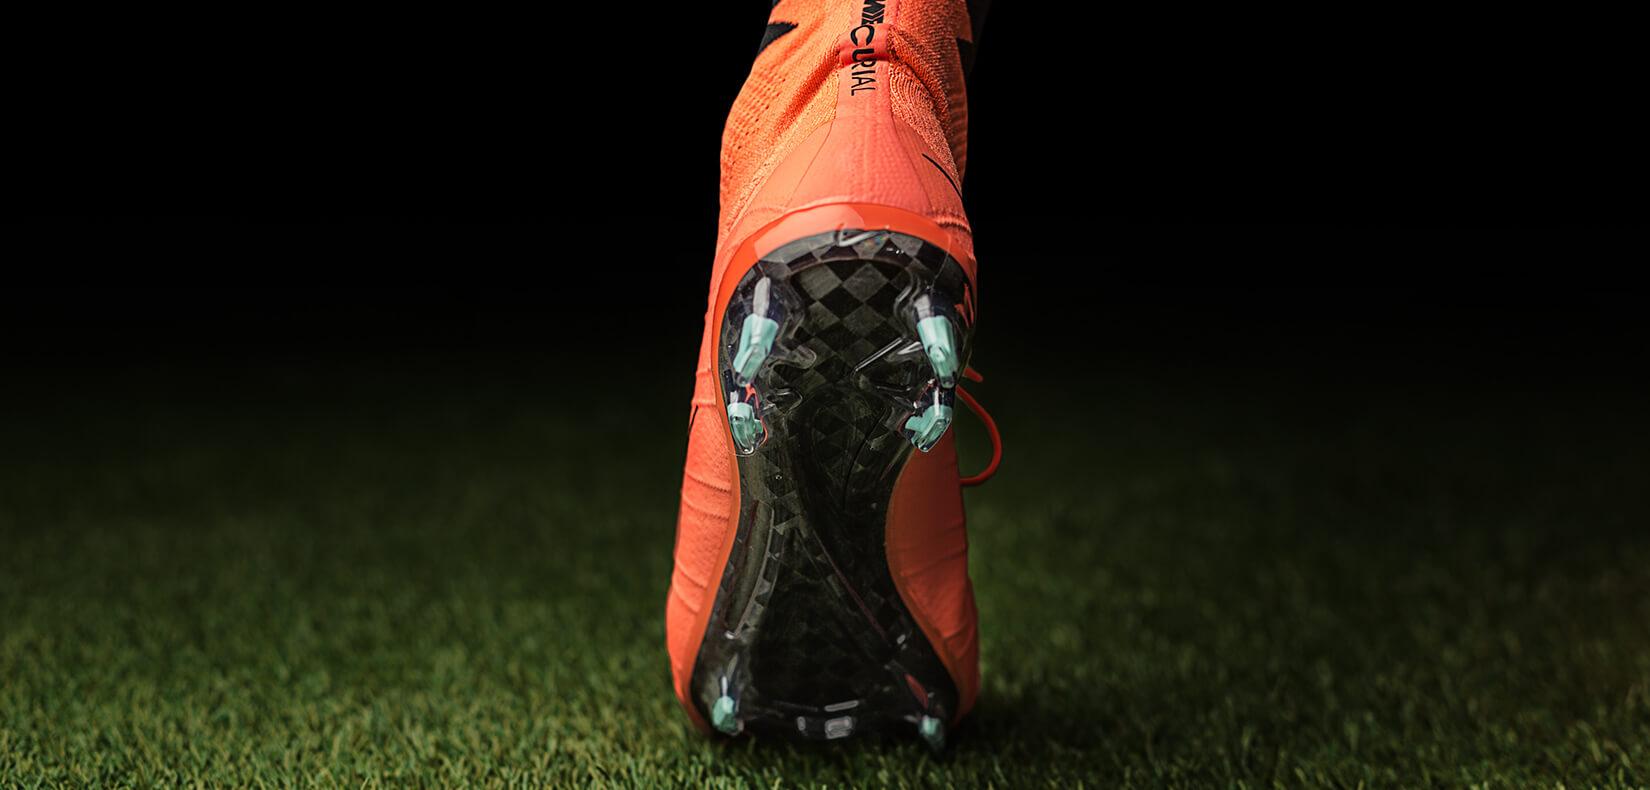 Retirarse Clasificar práctica  New Nike Mercurial Superfly Metal Flash Pack at Unisport